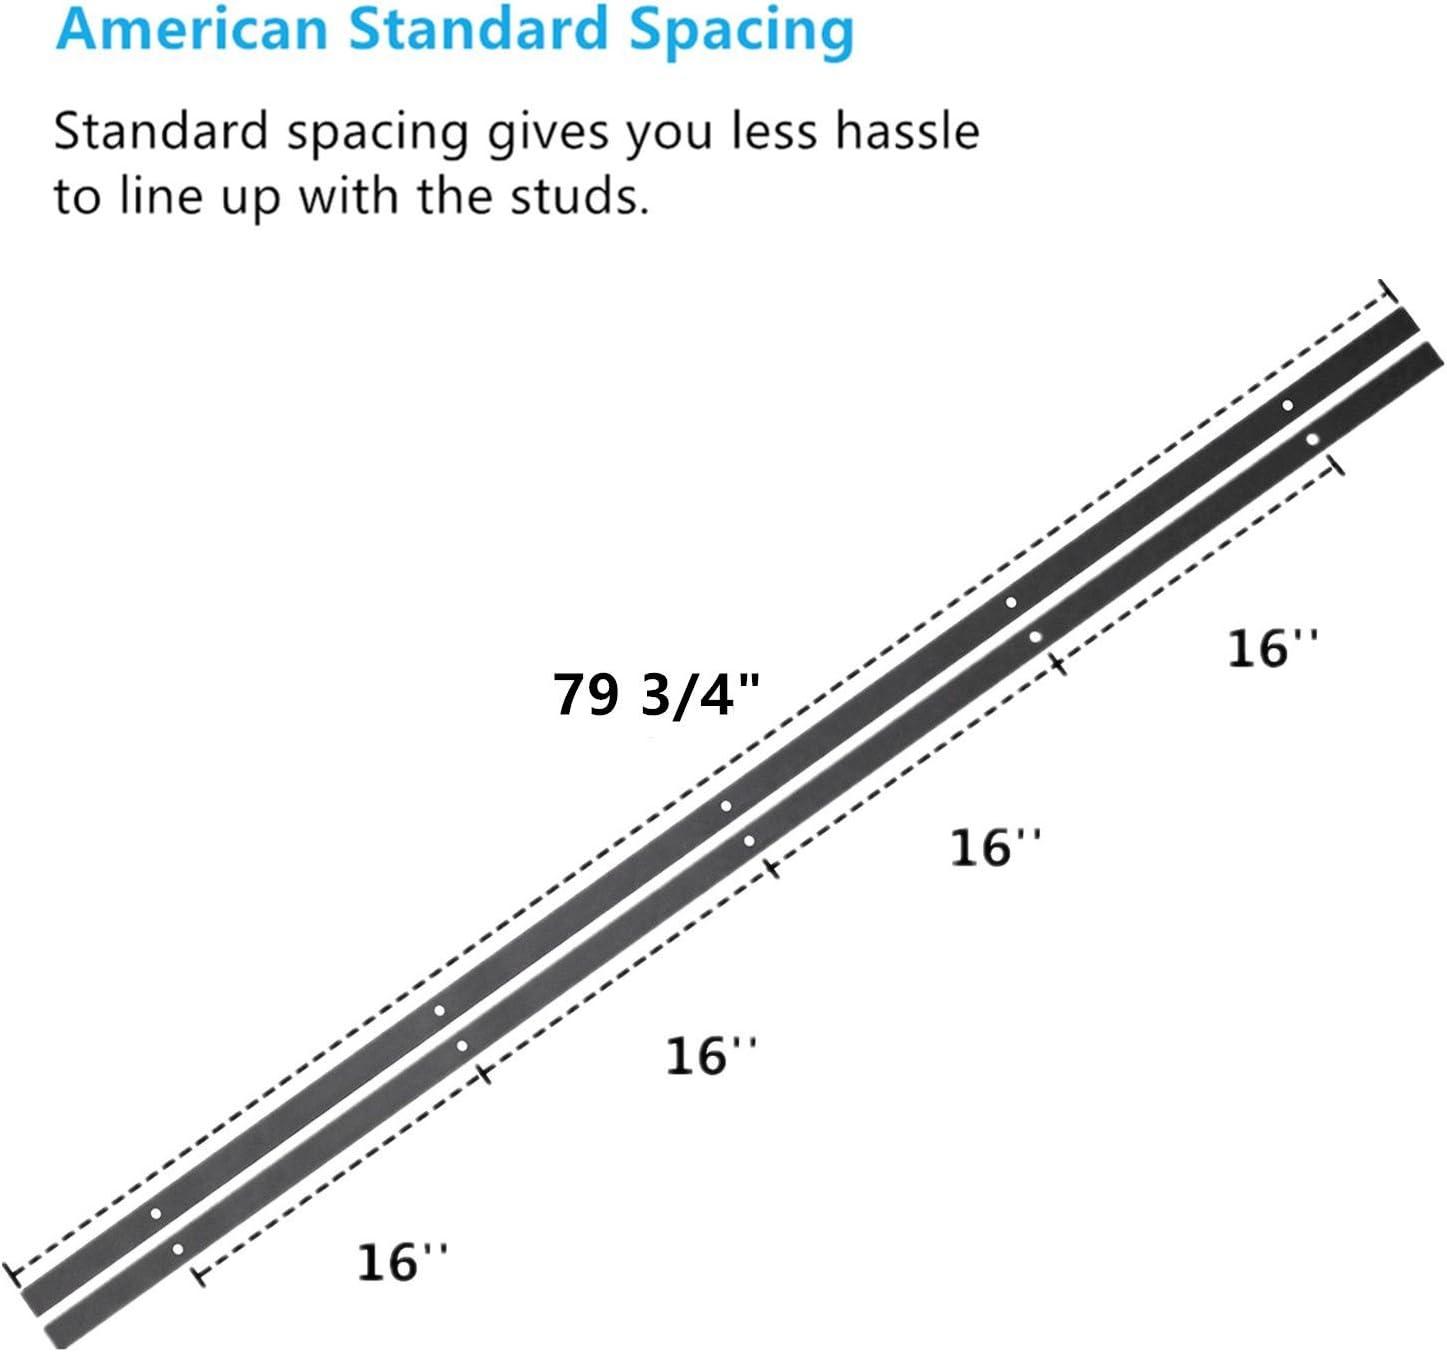 9FT Flat Track Z-Shape Bracket Straight Design Roller Black Rustic Heavy Duty Interior Exterior Use Homacer Sliding Barn Door Hardware Bypass Double Door Kit